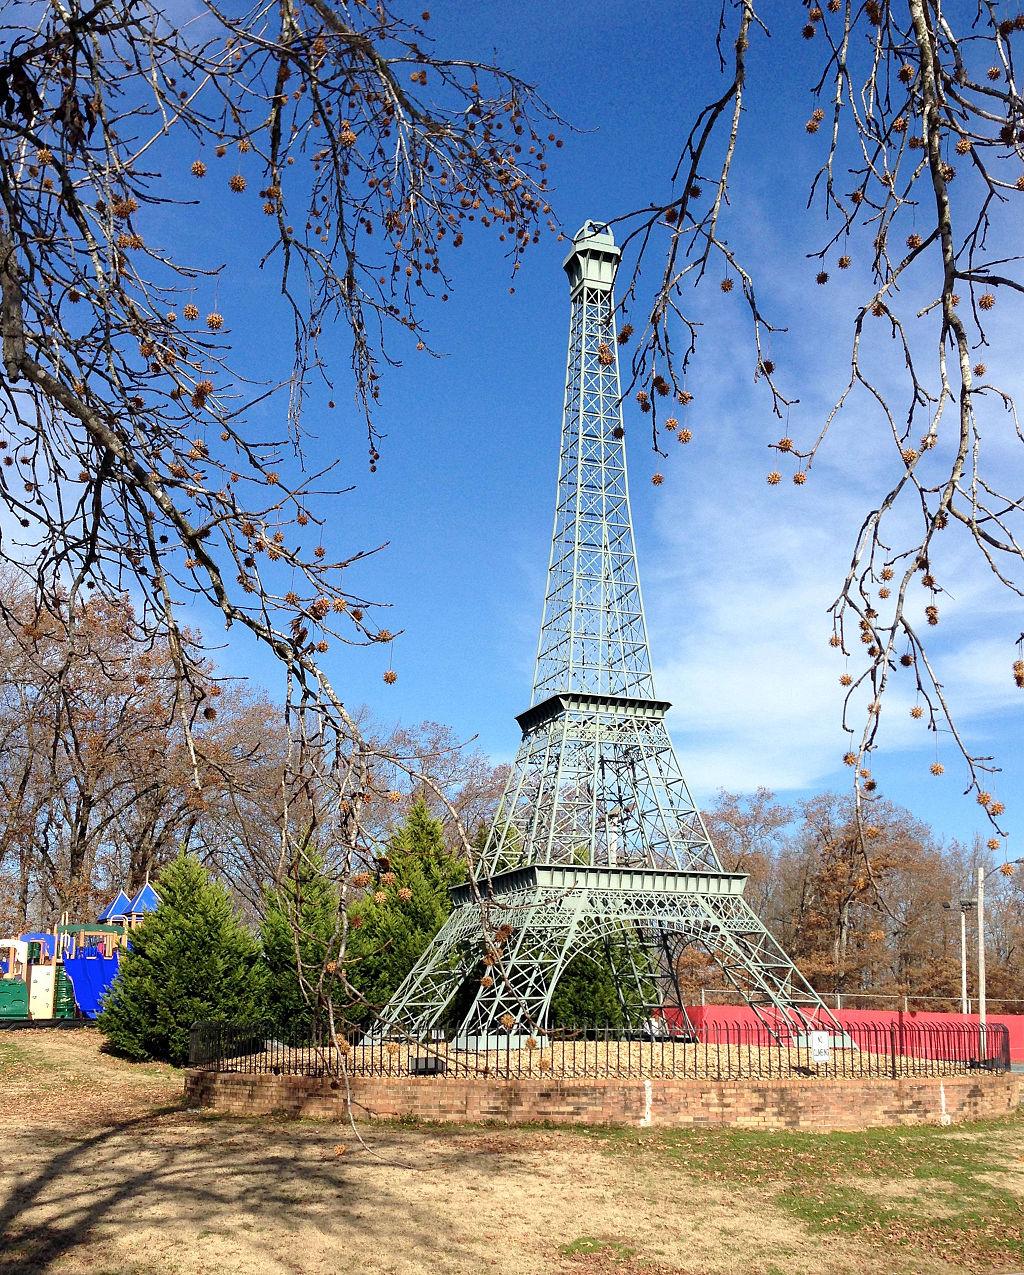 Eiffel_Tower_in_Paris,_Tennessee,_November_30,_2013